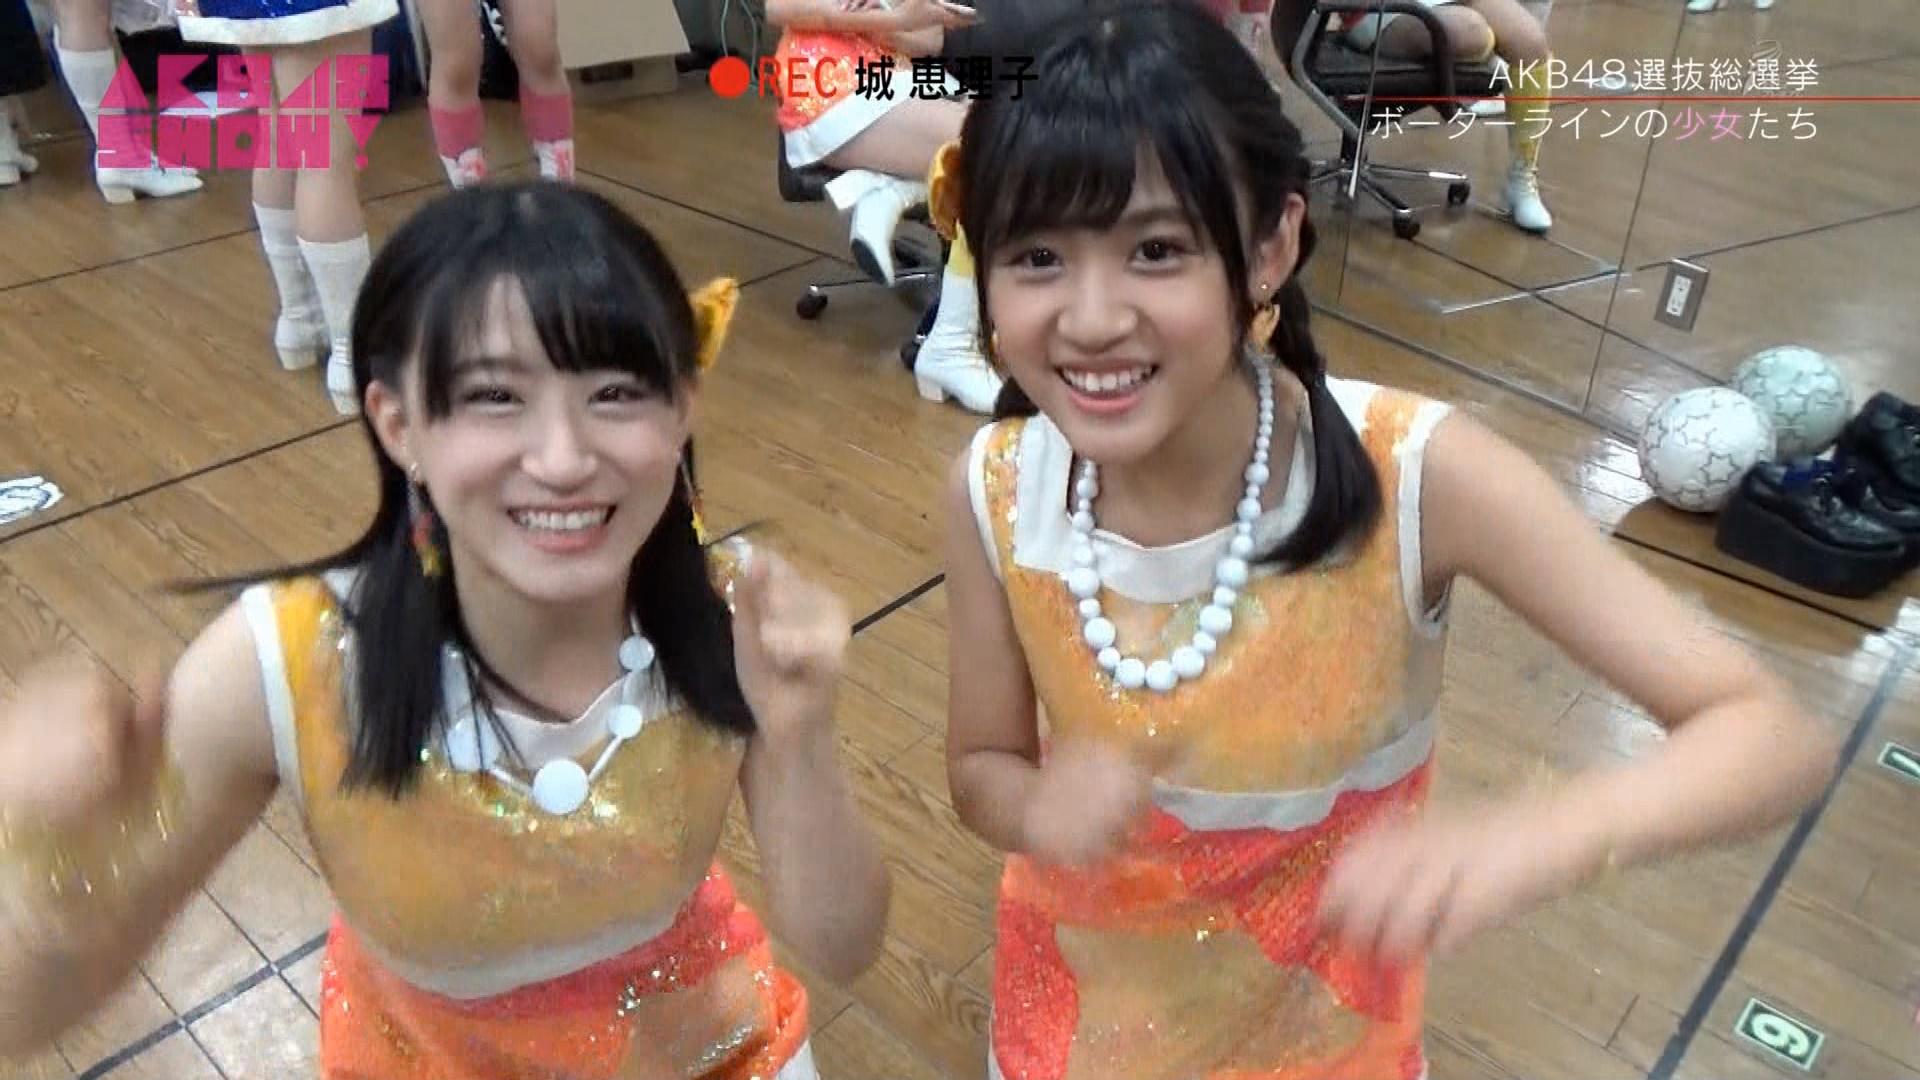 【NMB48】上西怜応援スレ★6【れーちゃん】 YouTube動画>8本 ->画像>1142枚